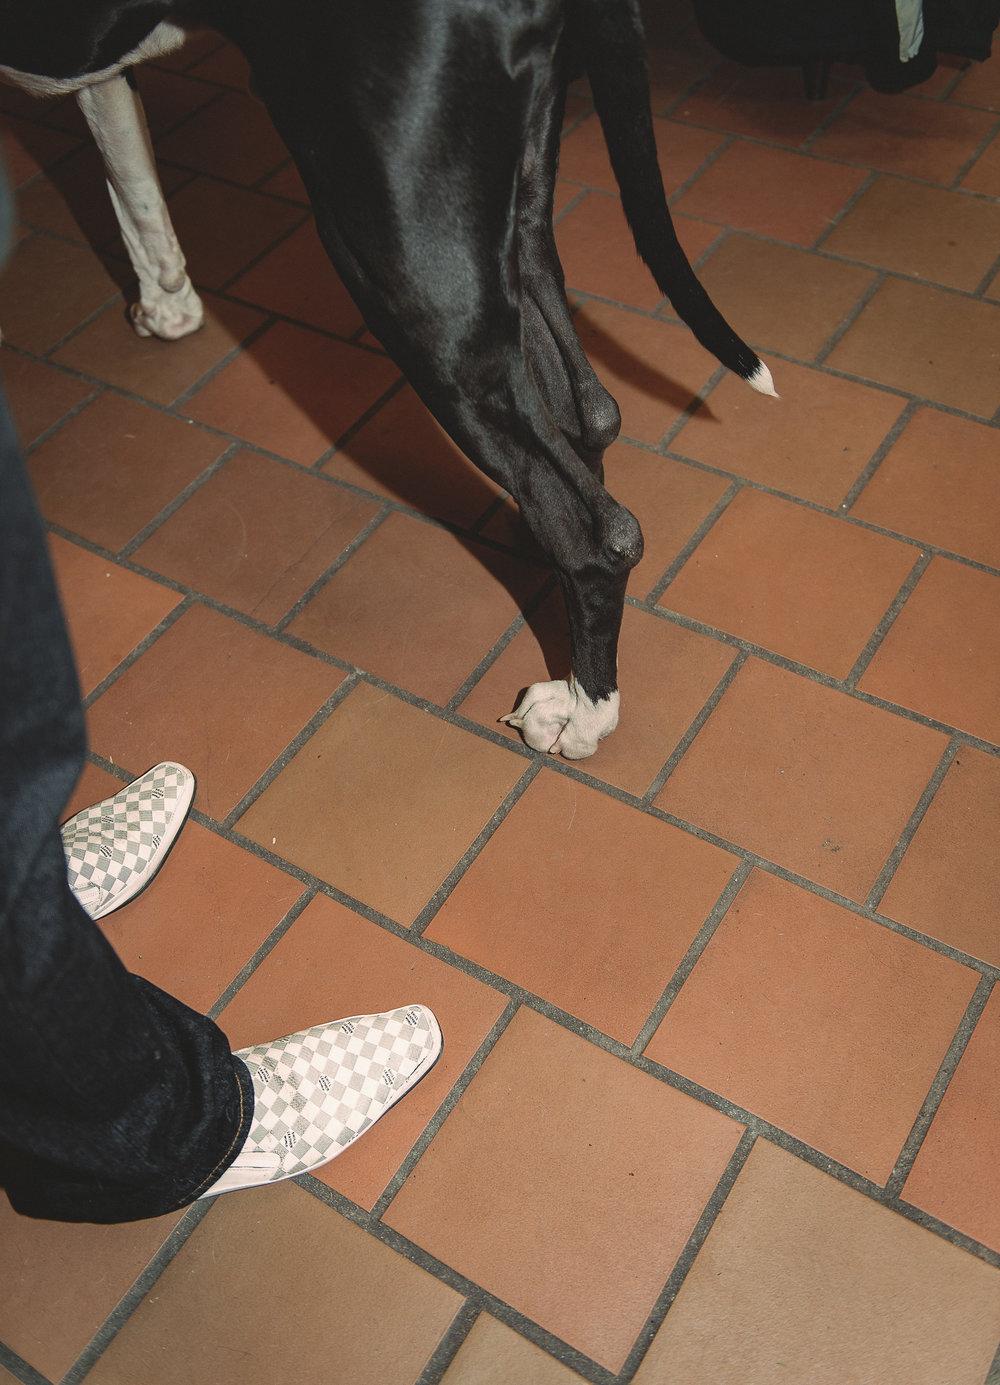 klaus+dyba+dog+show-7.jpg